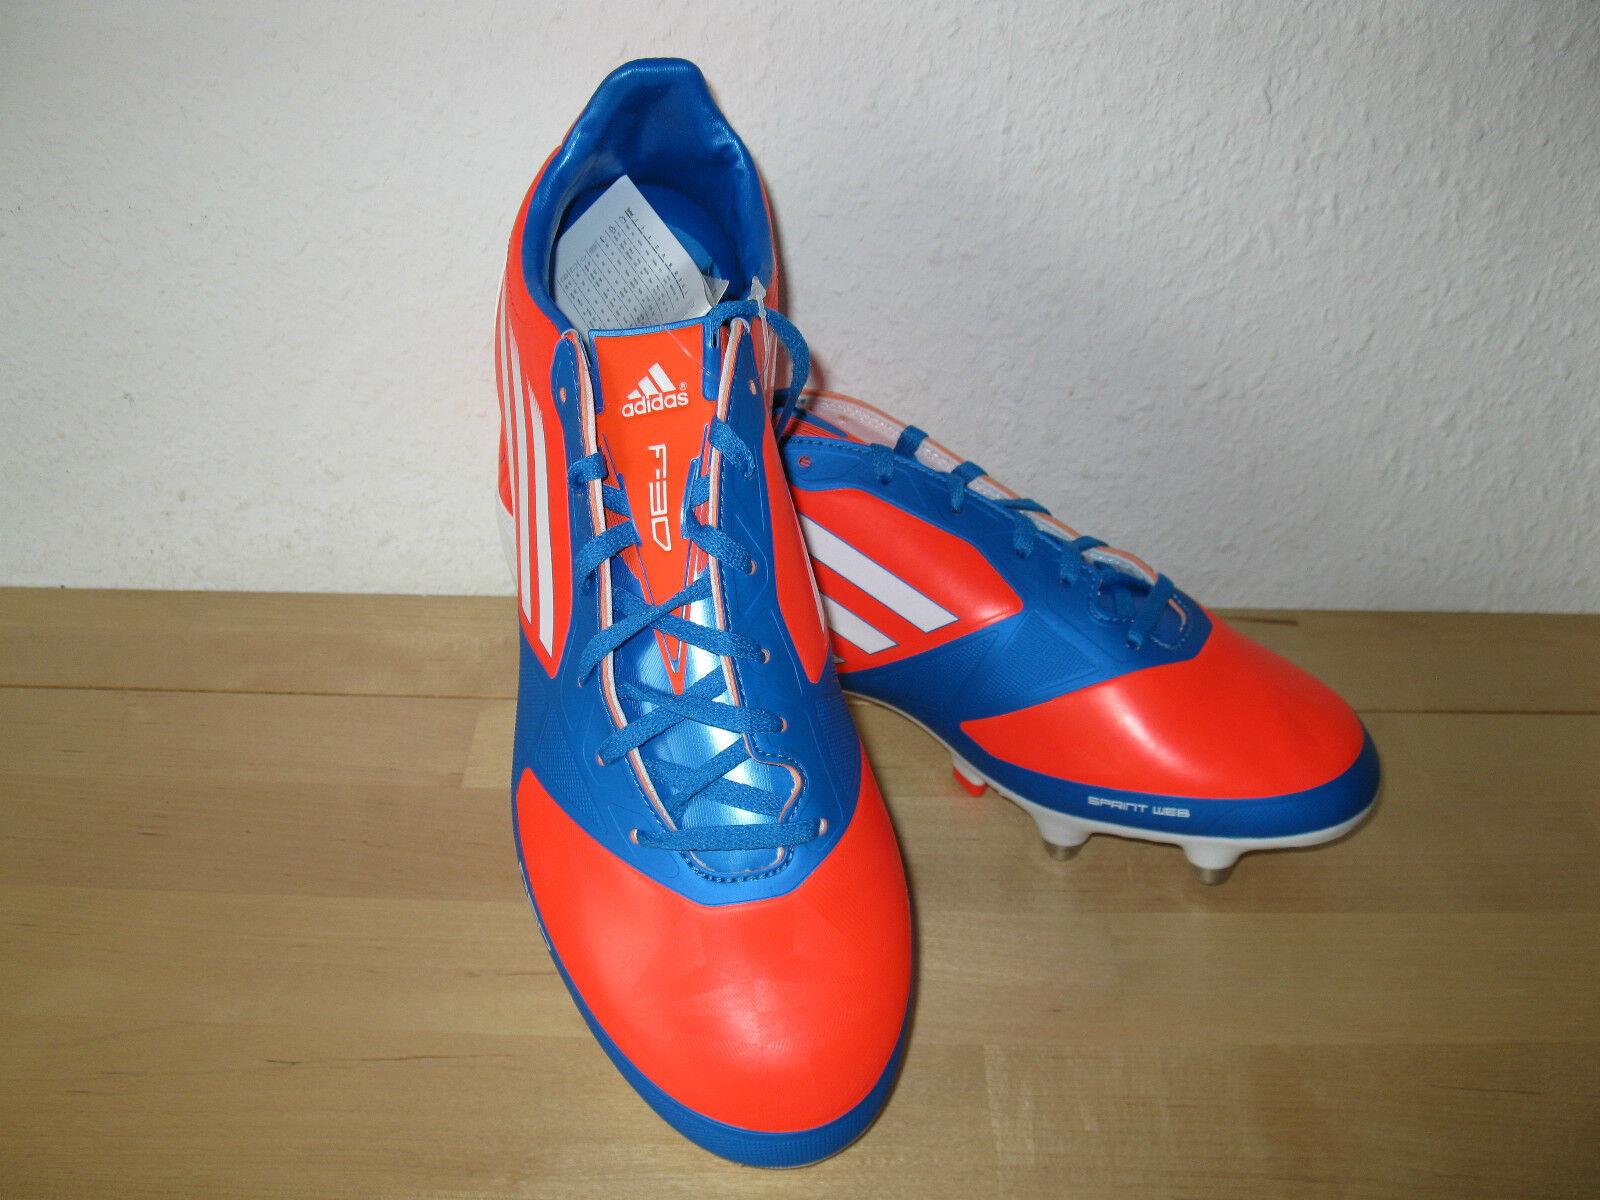 Adidas F30 TRX Sg Adizero Men's Soccer shoes Studs Nip